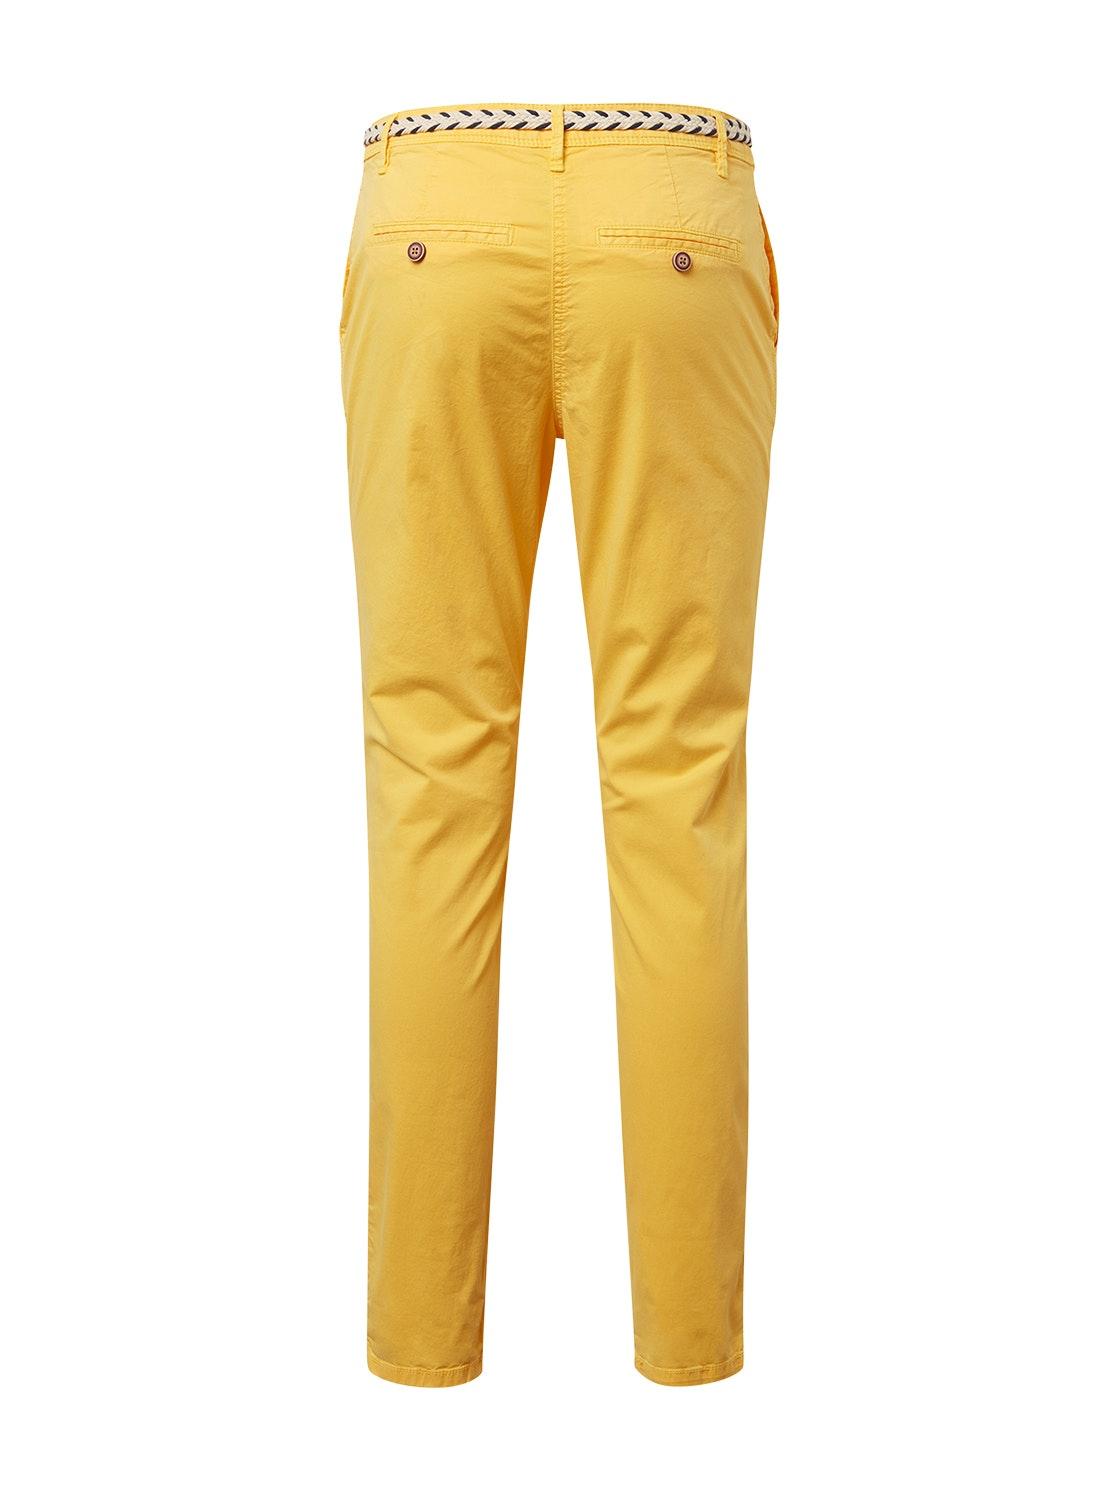 de6baafa0f088e ... Vorschau  Tom Tailor Damen Chino Hose Slim 1008380.xx.70 10382 yellow  WF19